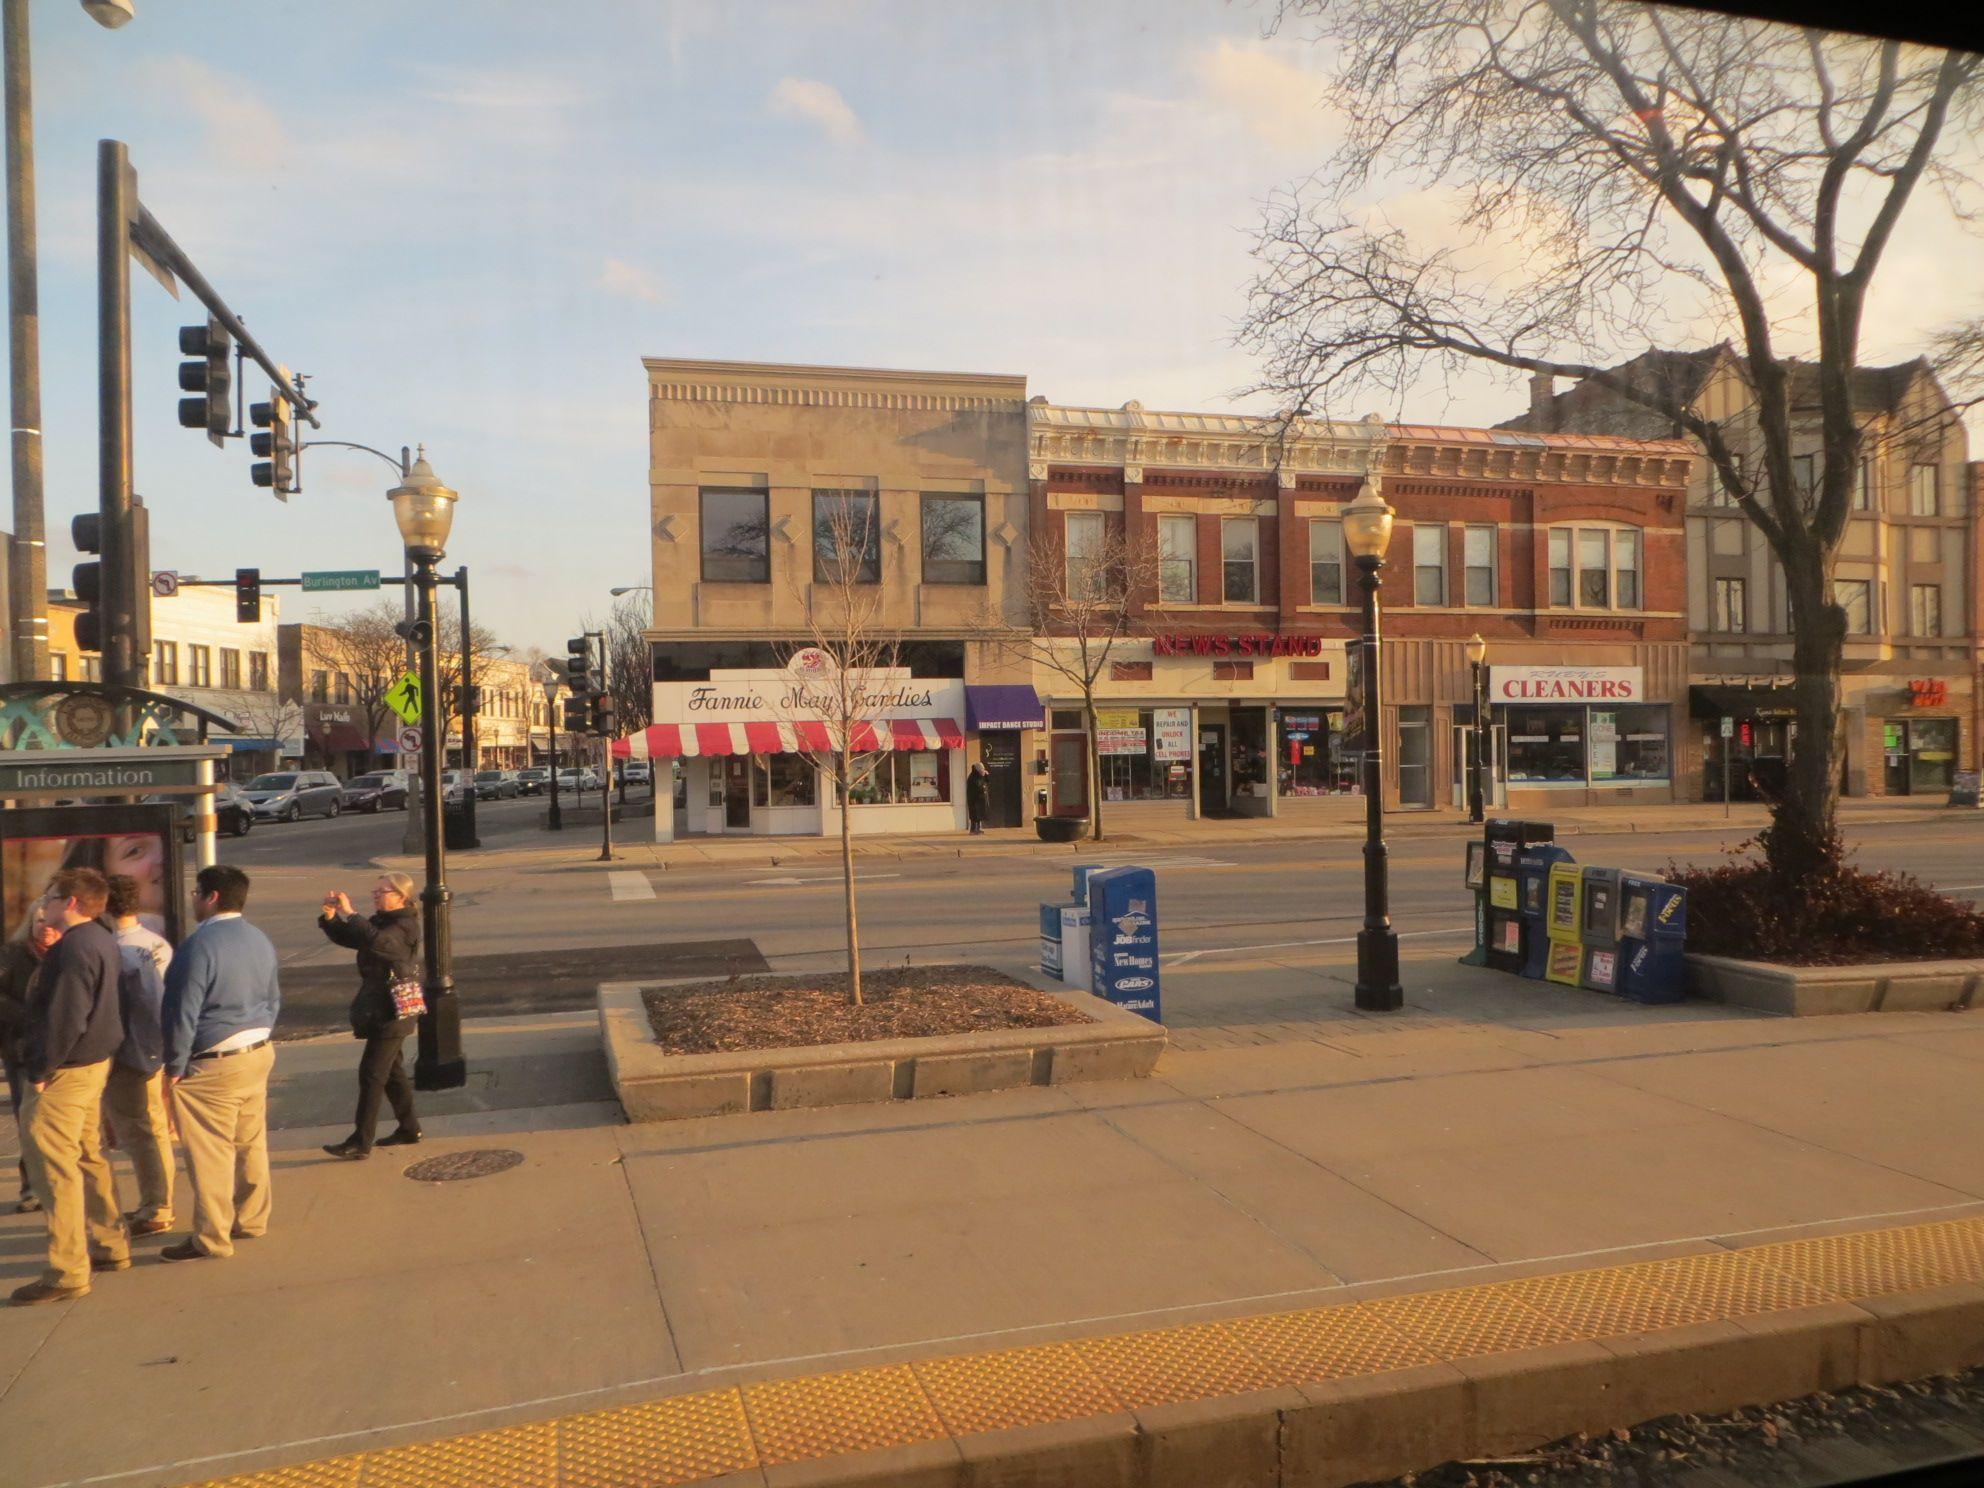 La Grange Illinois Cities Ive Trekked 2014 Pinterest